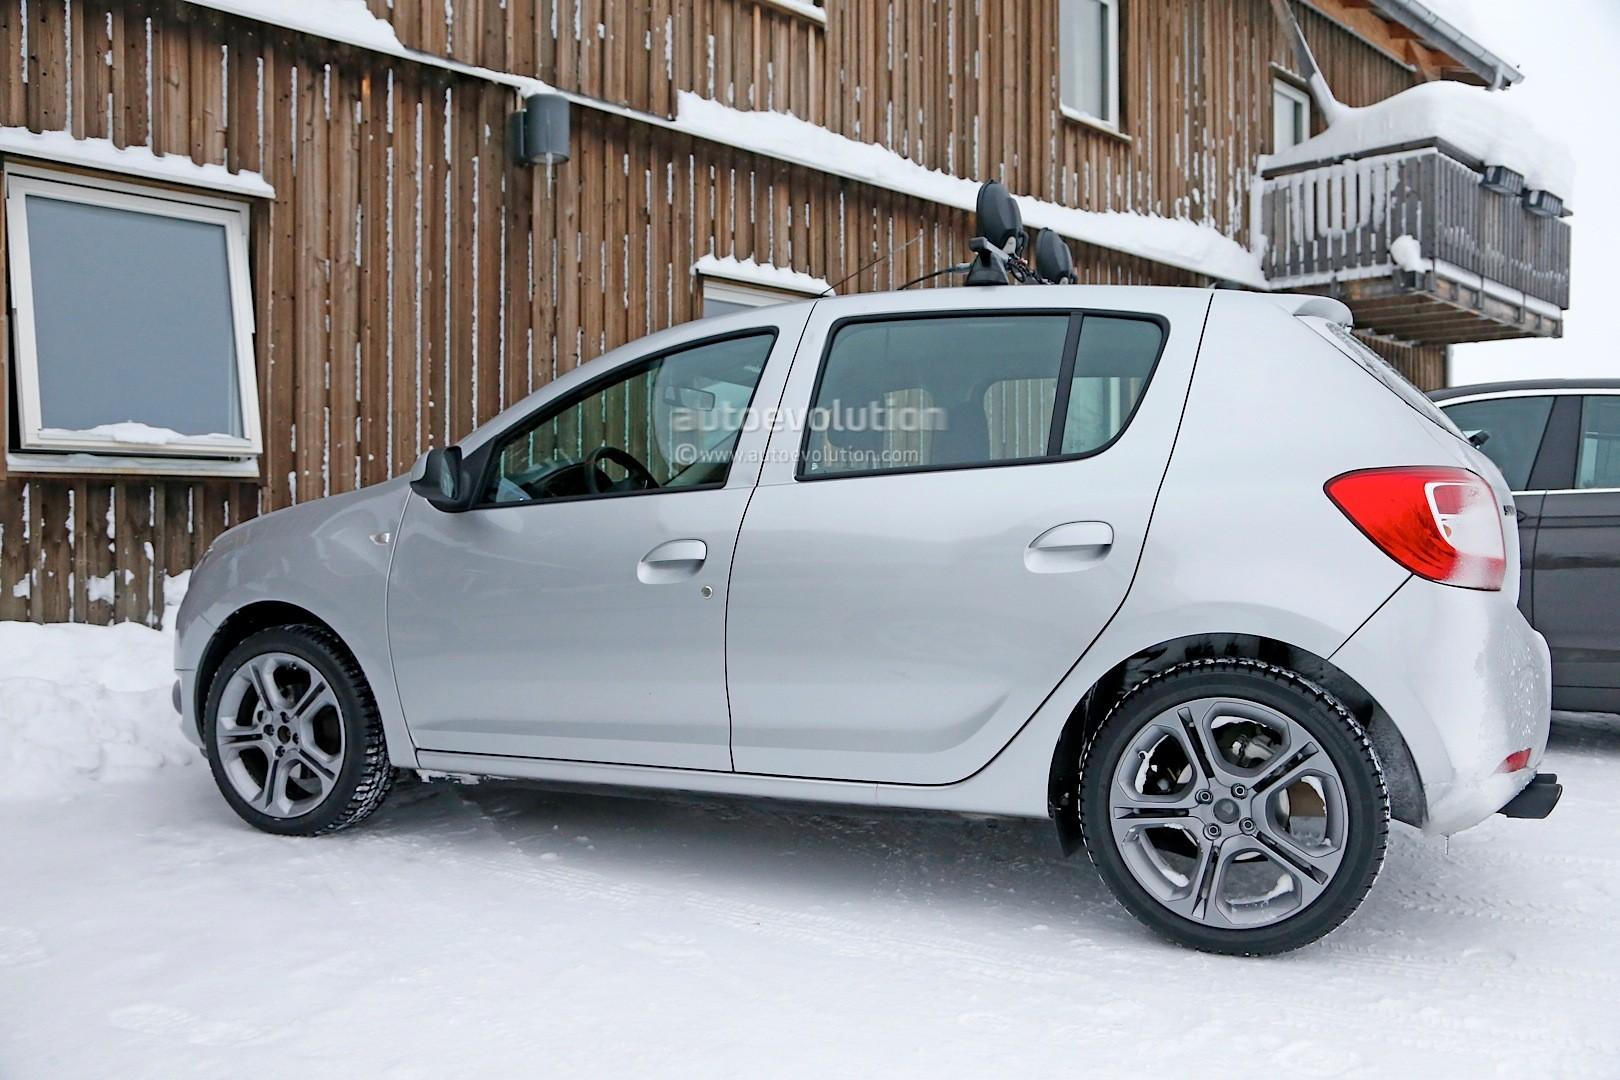 2012 - [Dacia] Sandero II - Page 14 Spyshots-dacia-sandero-rs-getting-12-turbo-engine-sportier-interior_3